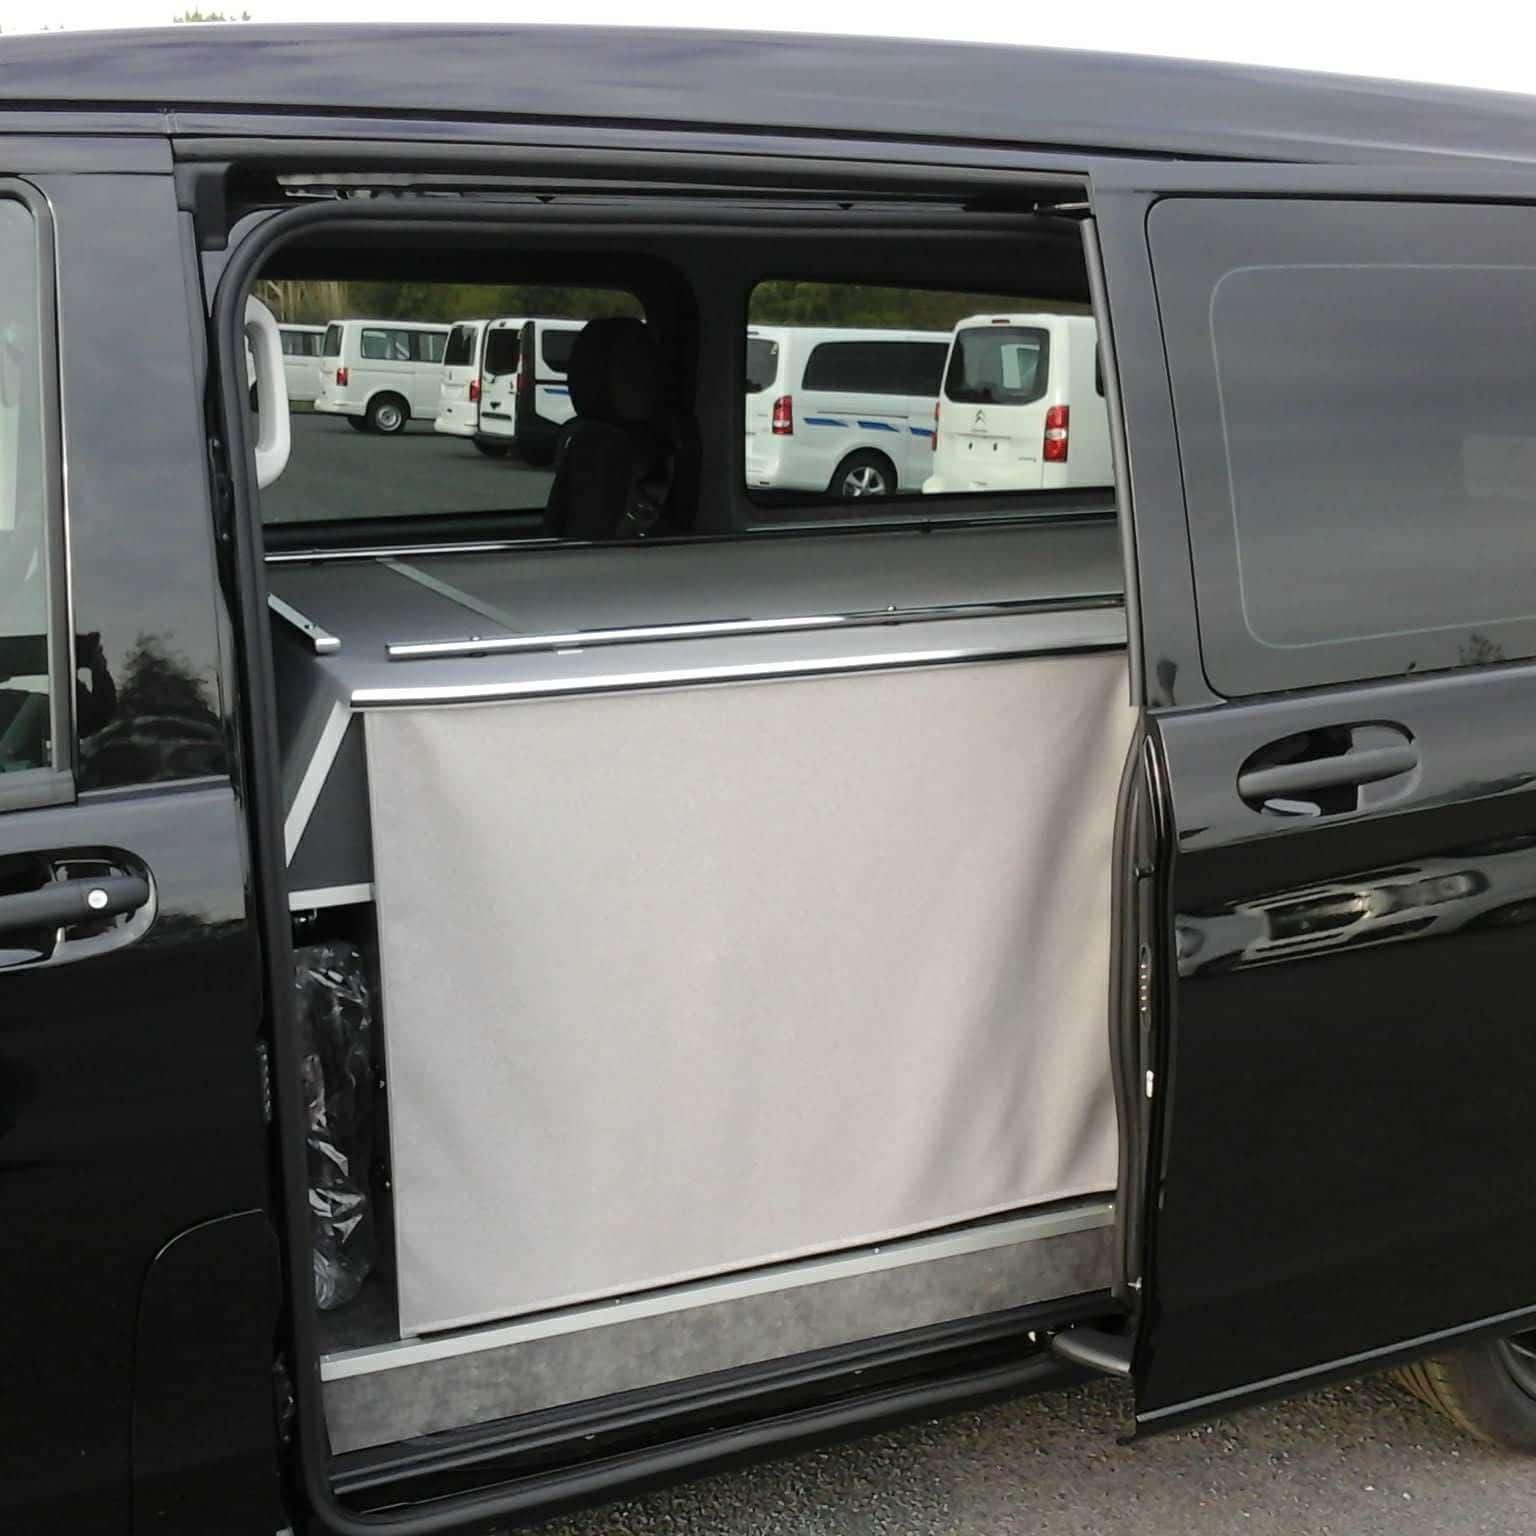 collet-funéraires-vito-8-disponible-fin-annee